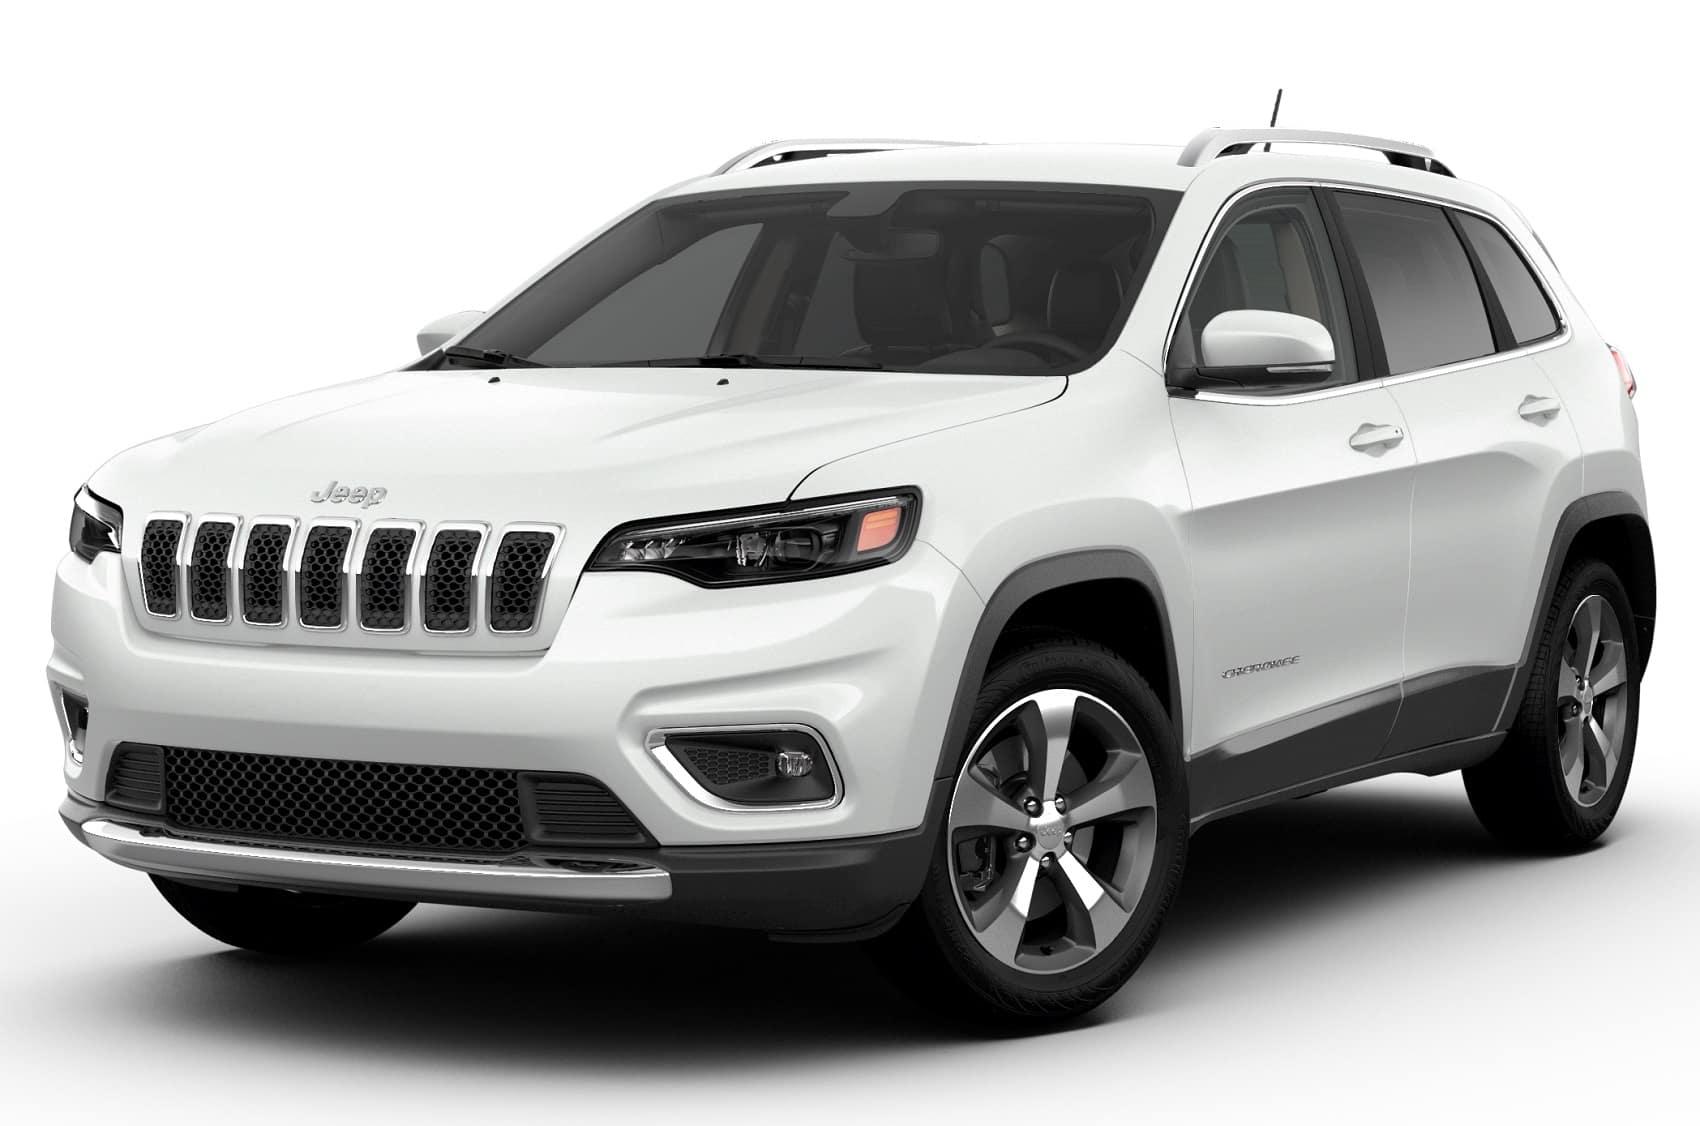 Jeep Cherokee Towing Capacity